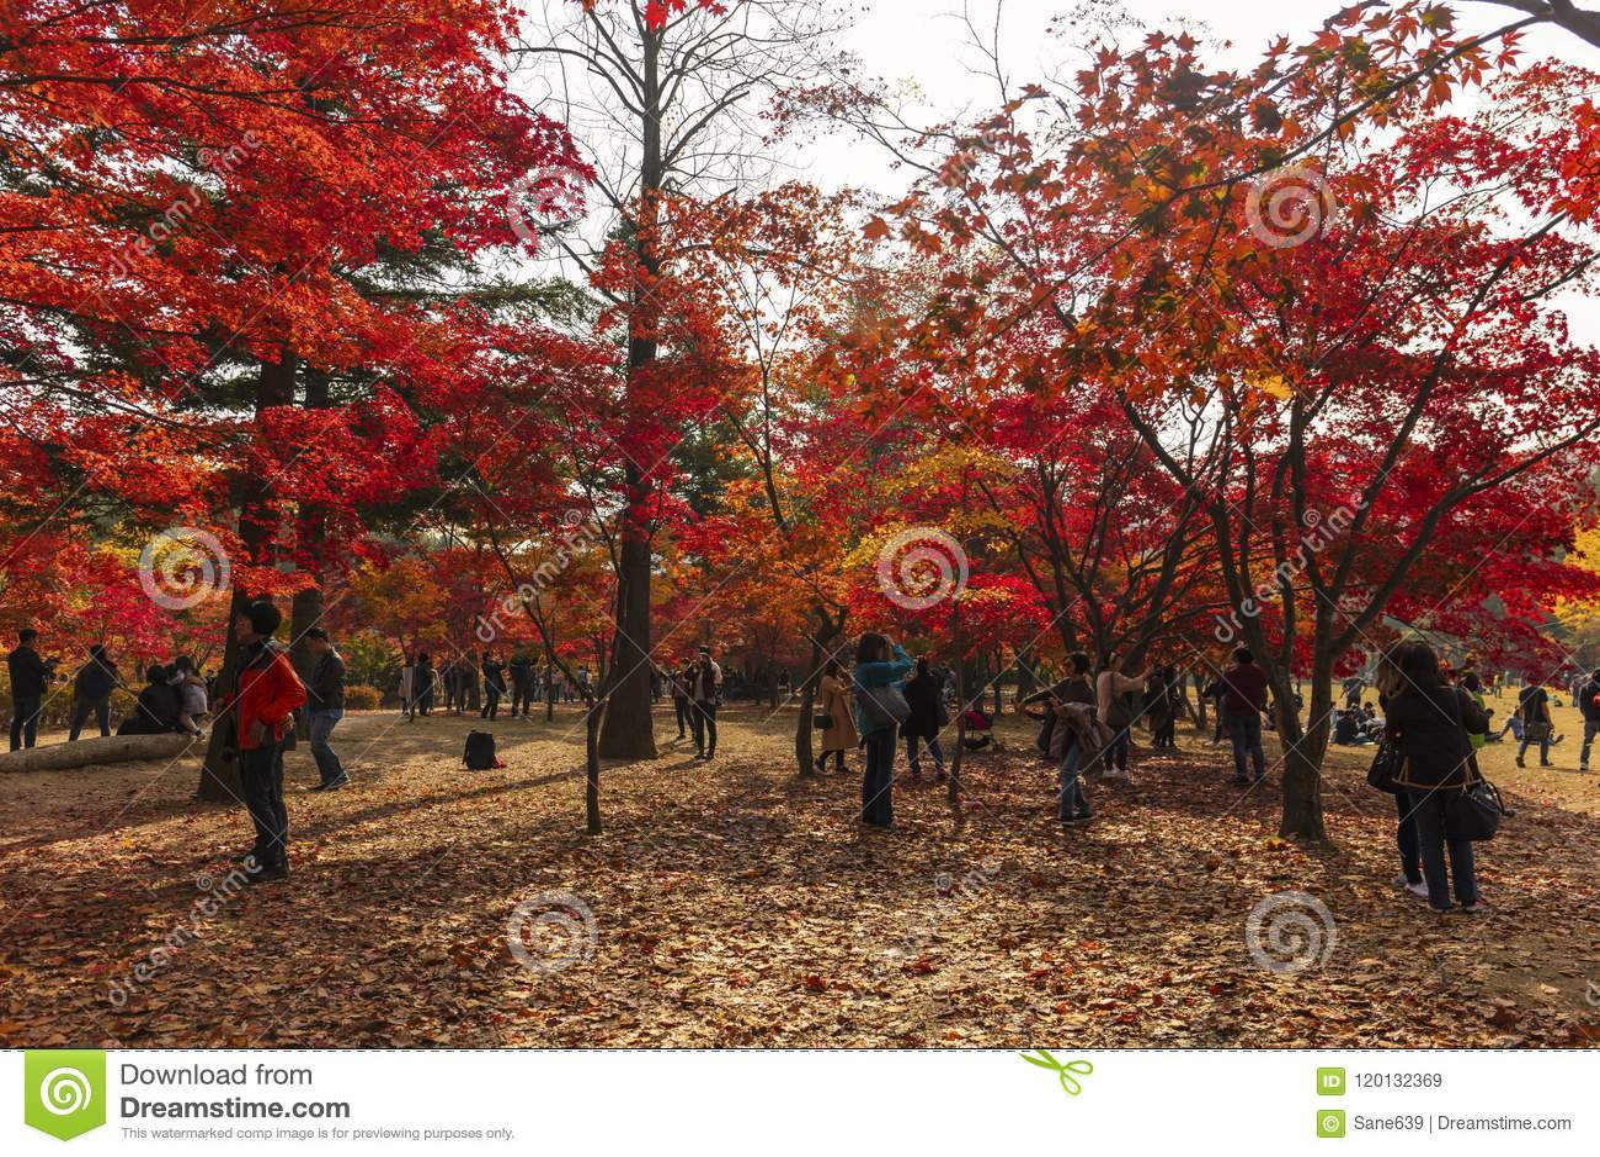 Autumn Of Nami Island In The Morning South Korea Editorial Stock ...